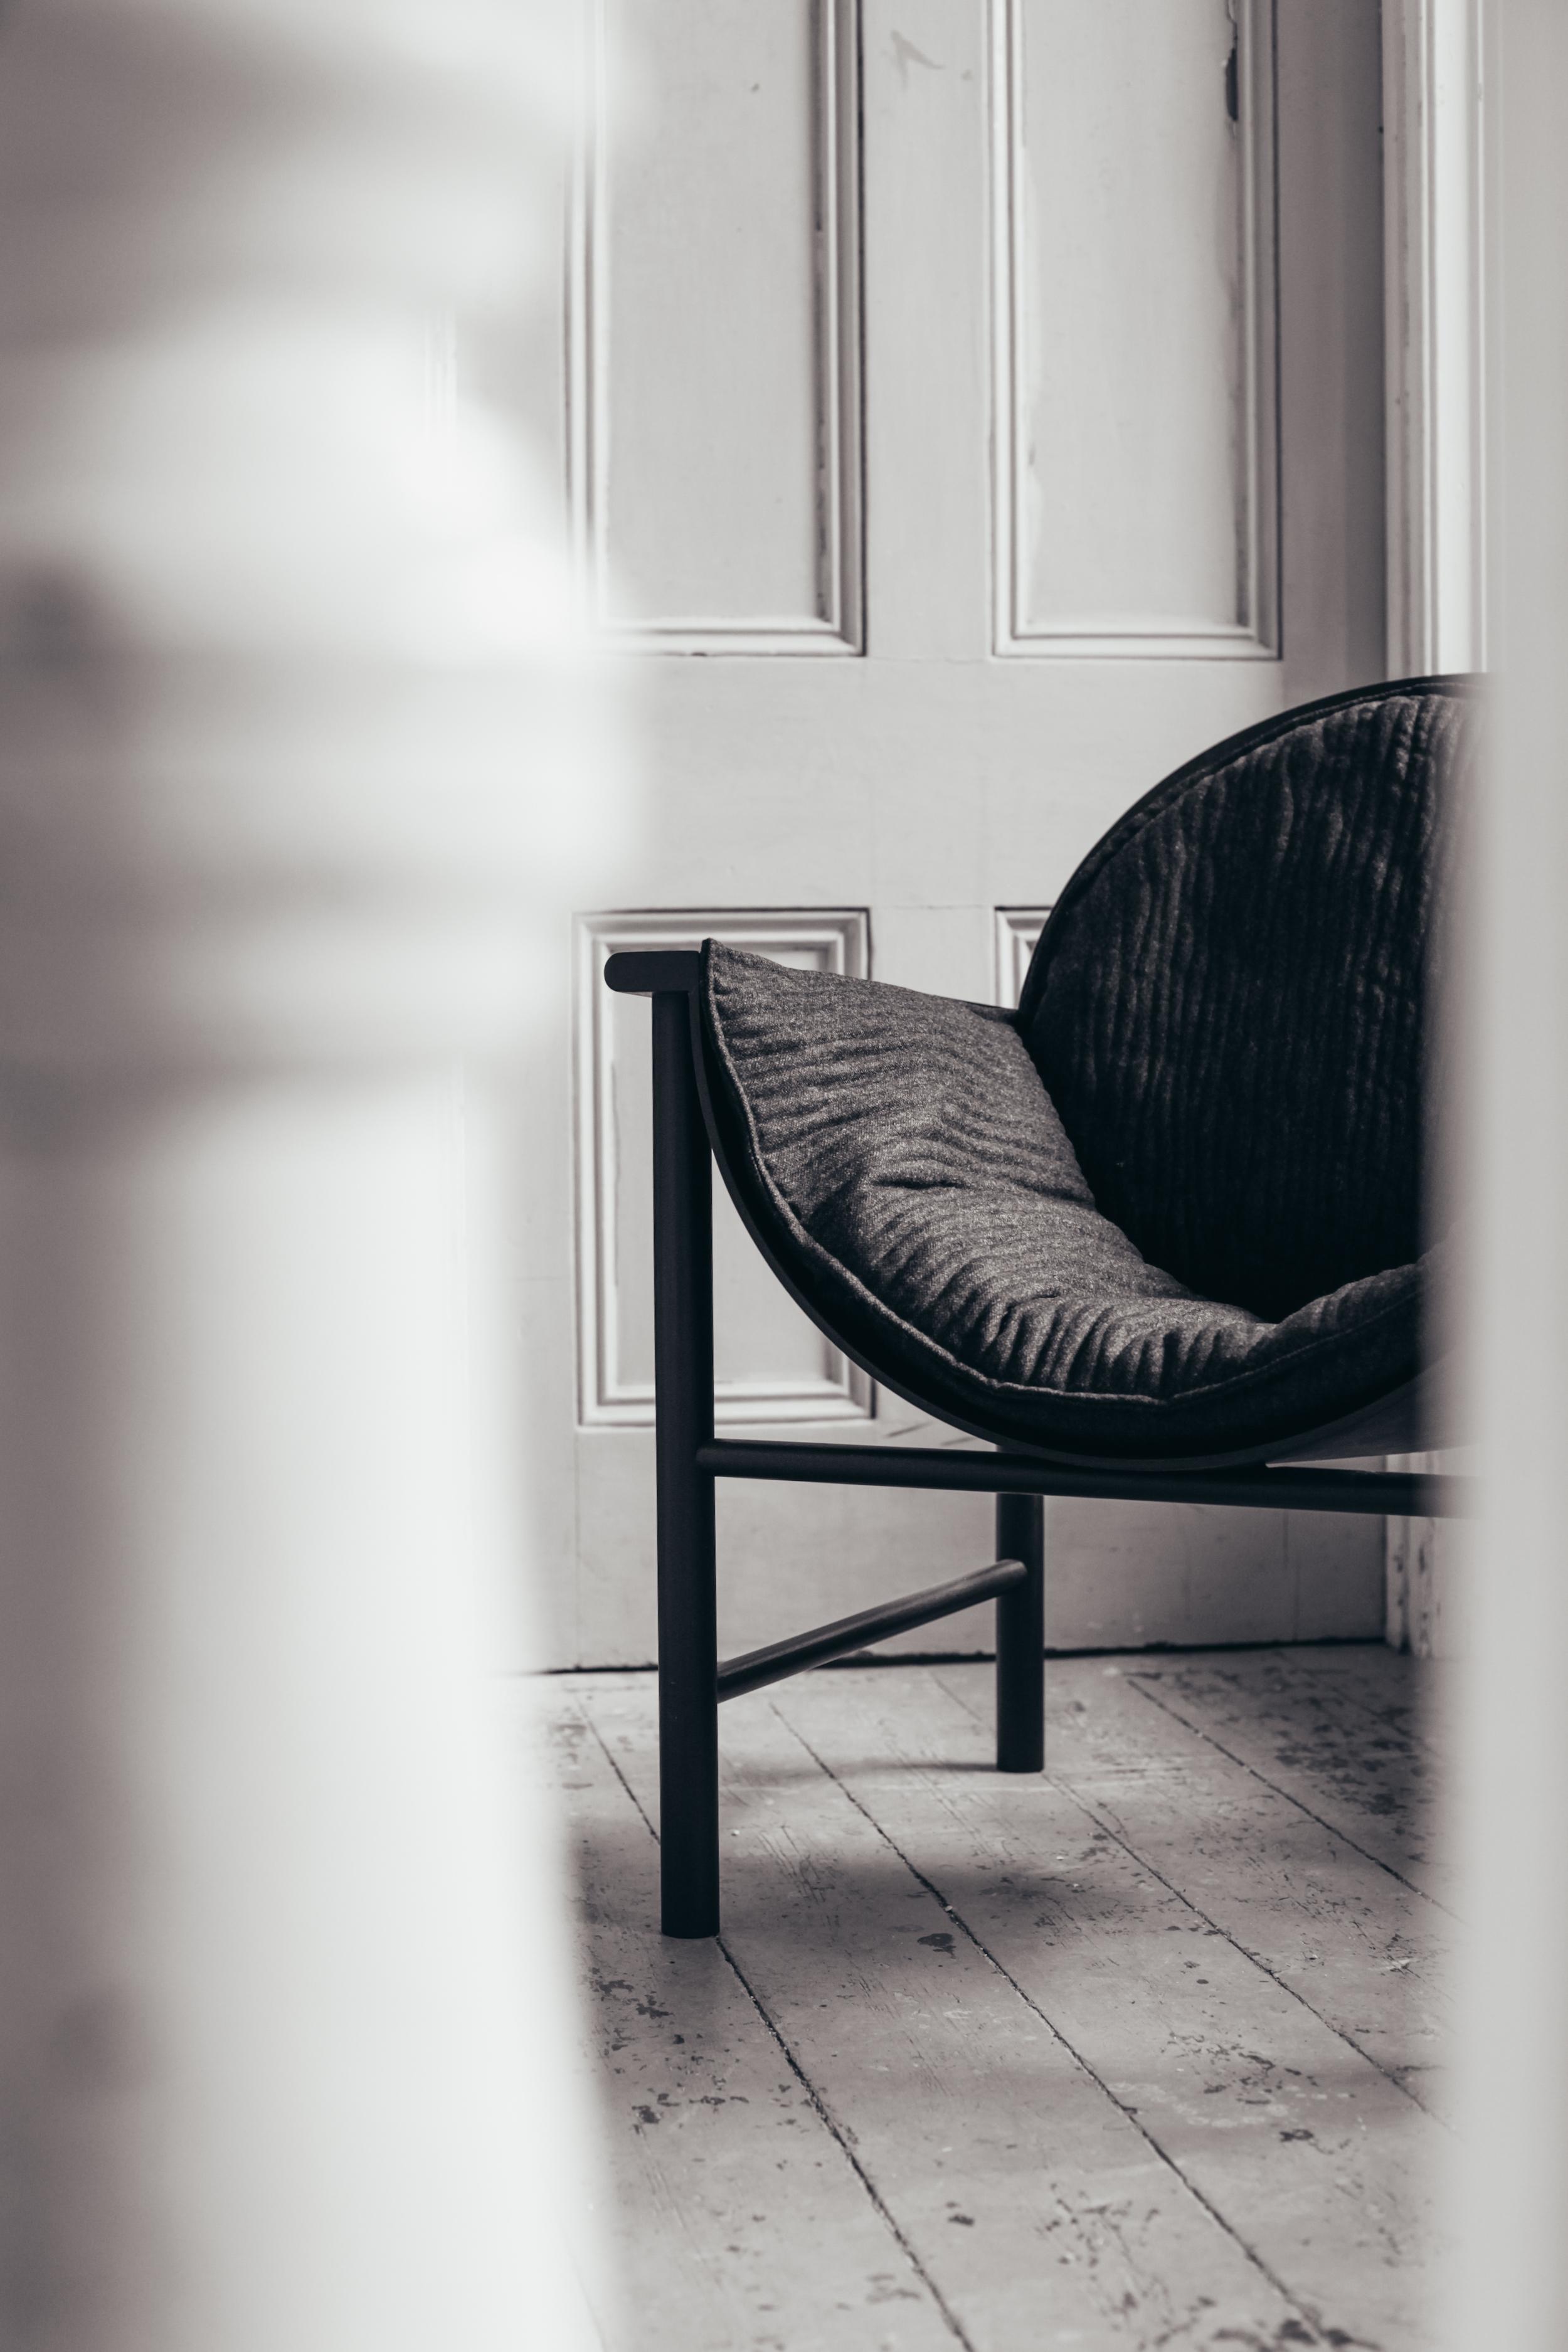 Lunar low resunar Chair - 1 of 15.jpg